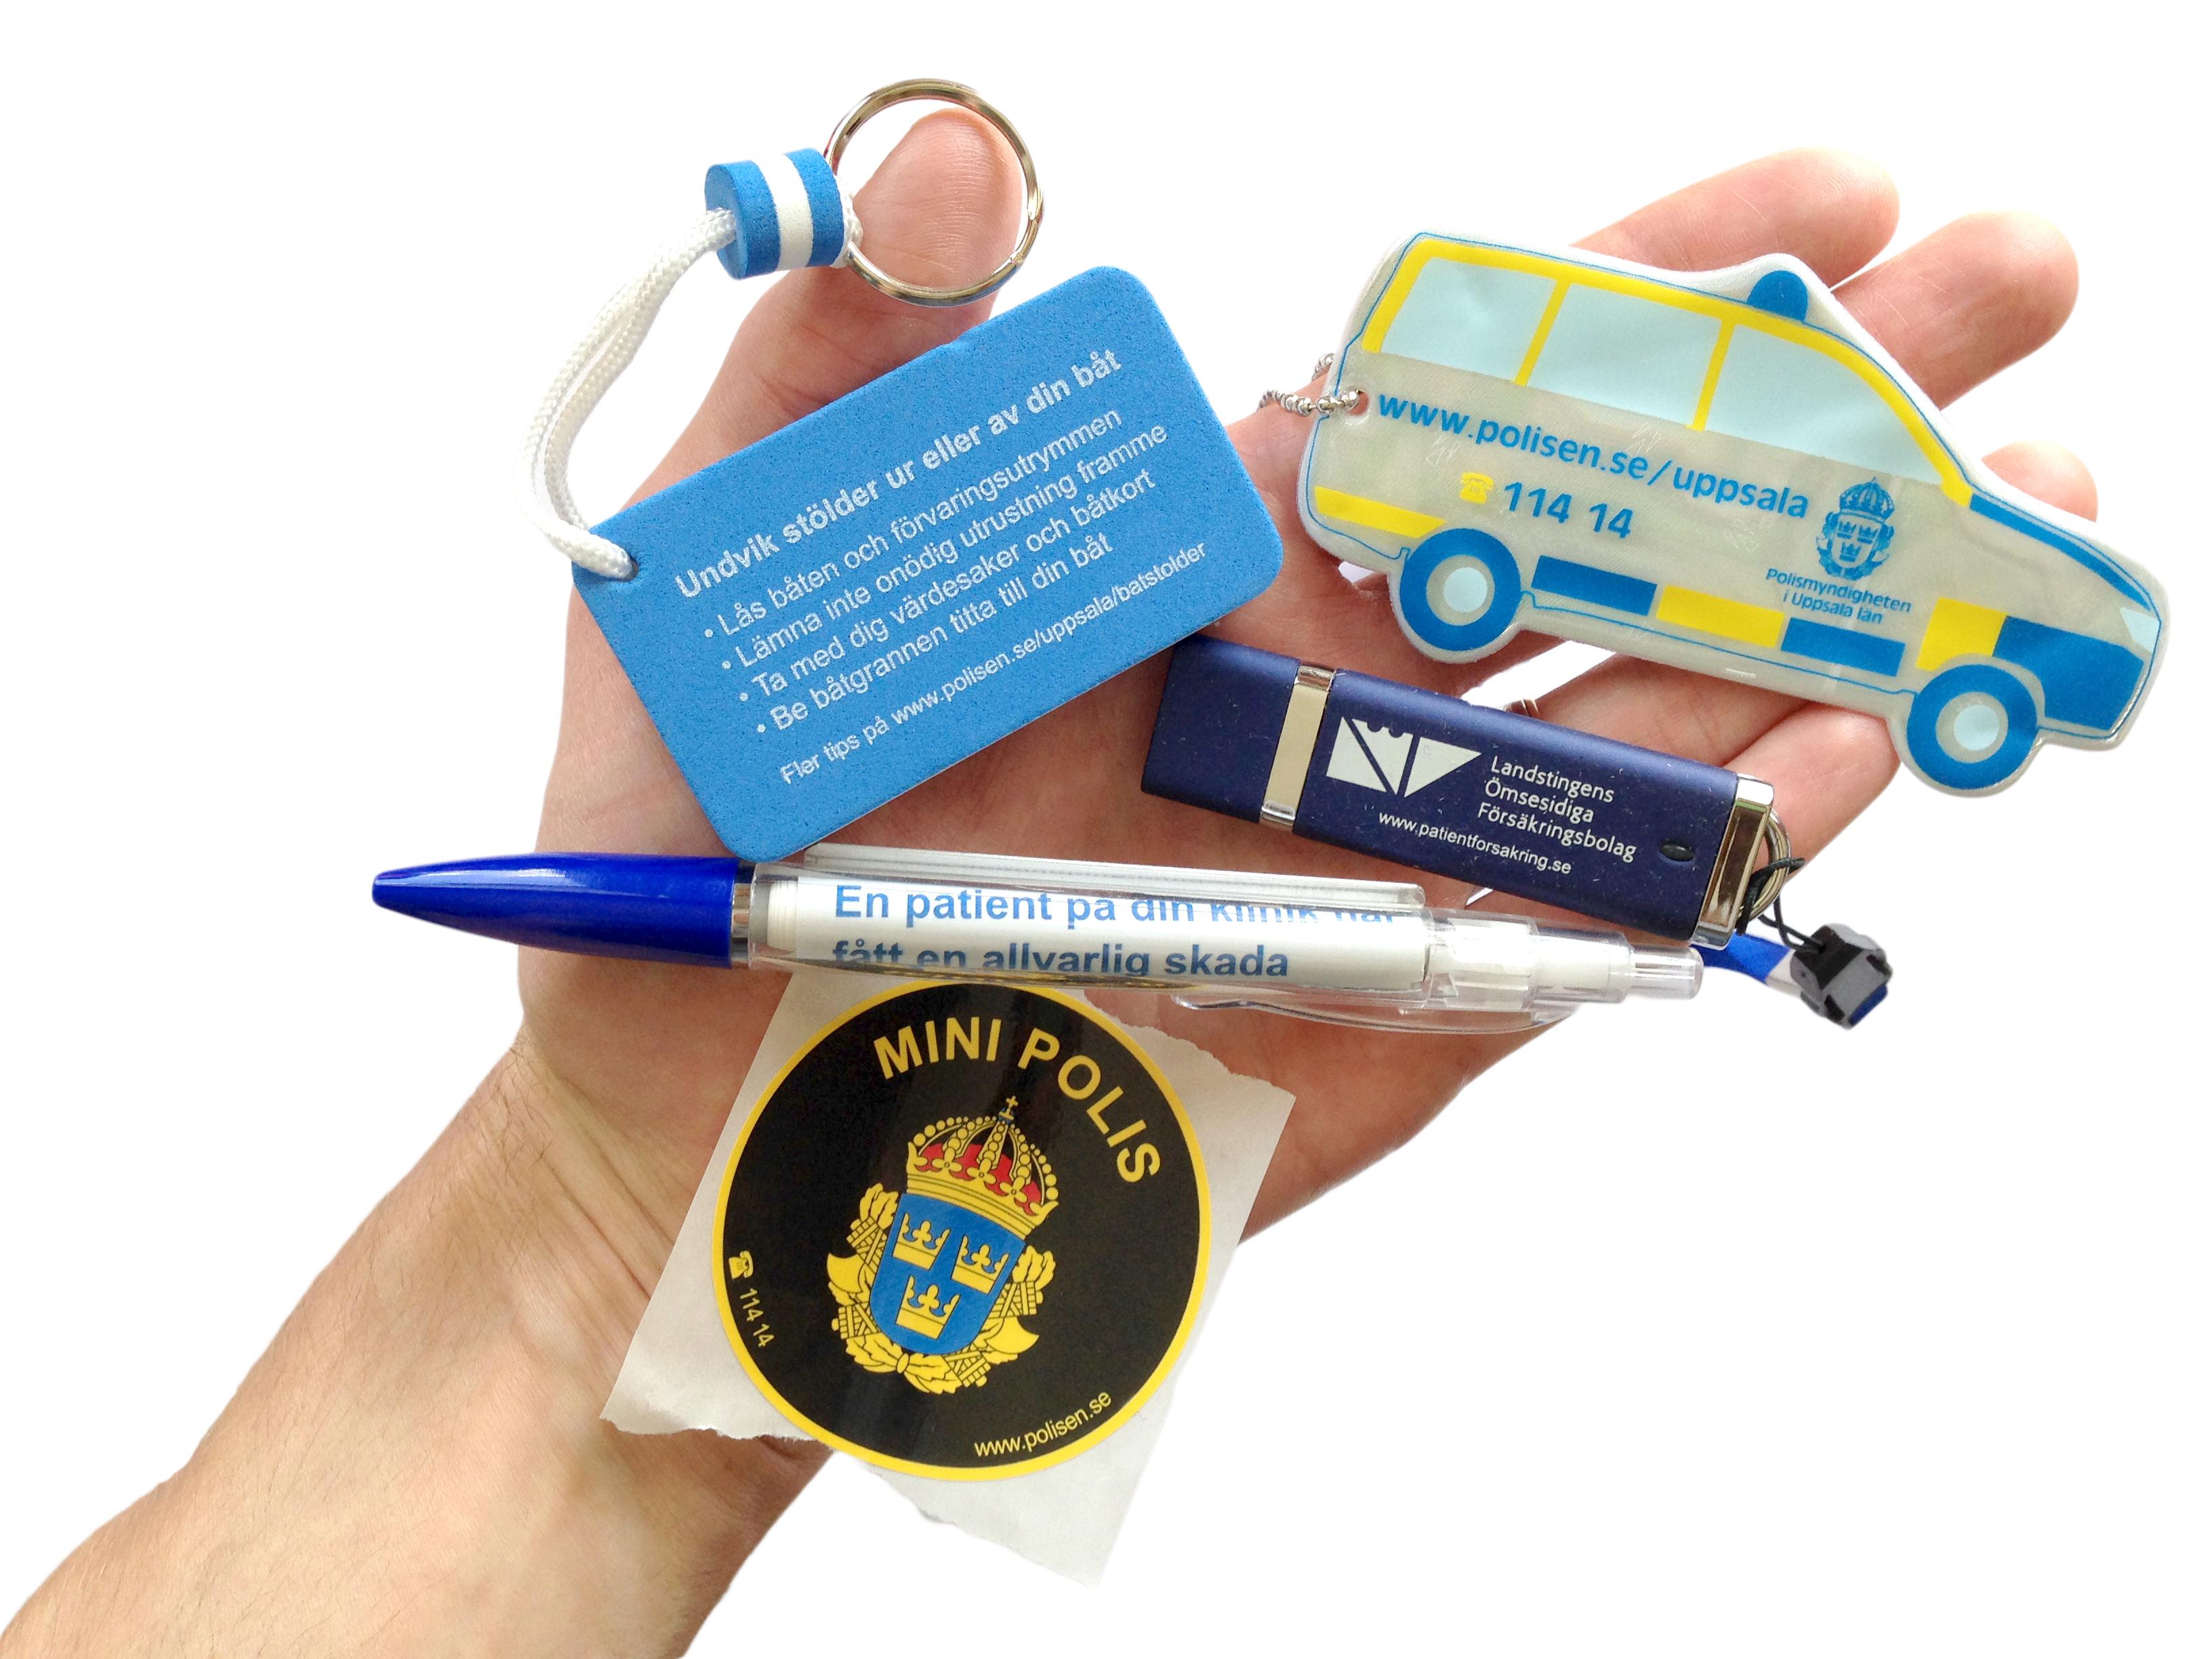 PR-artiklar, reflex, penna, USB-minne, klistermärke